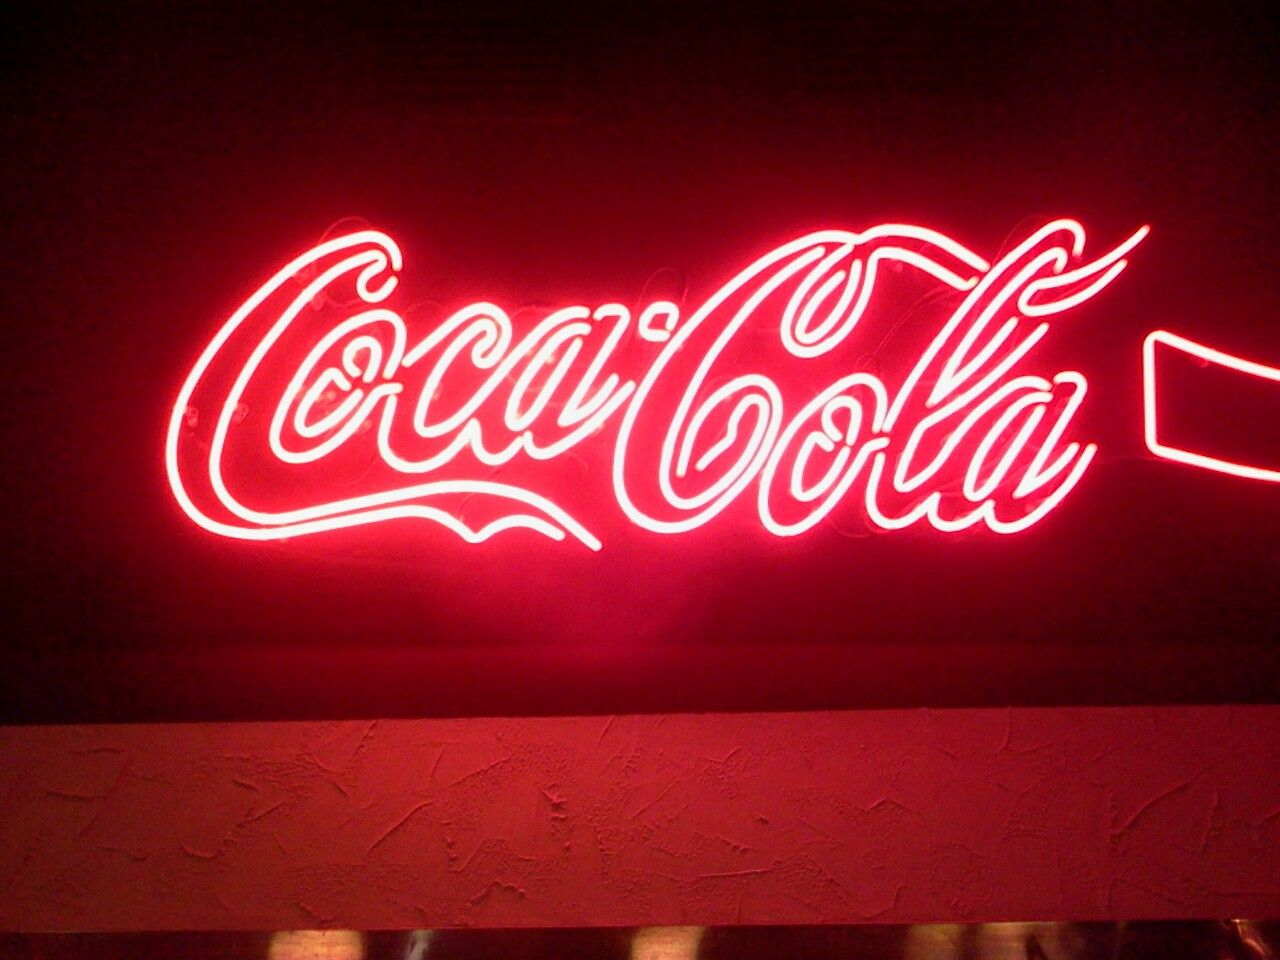 New Coca-Coke-Cola Bottle Real Glass Neon Sign Beer Bar Light Handmade Man Cave